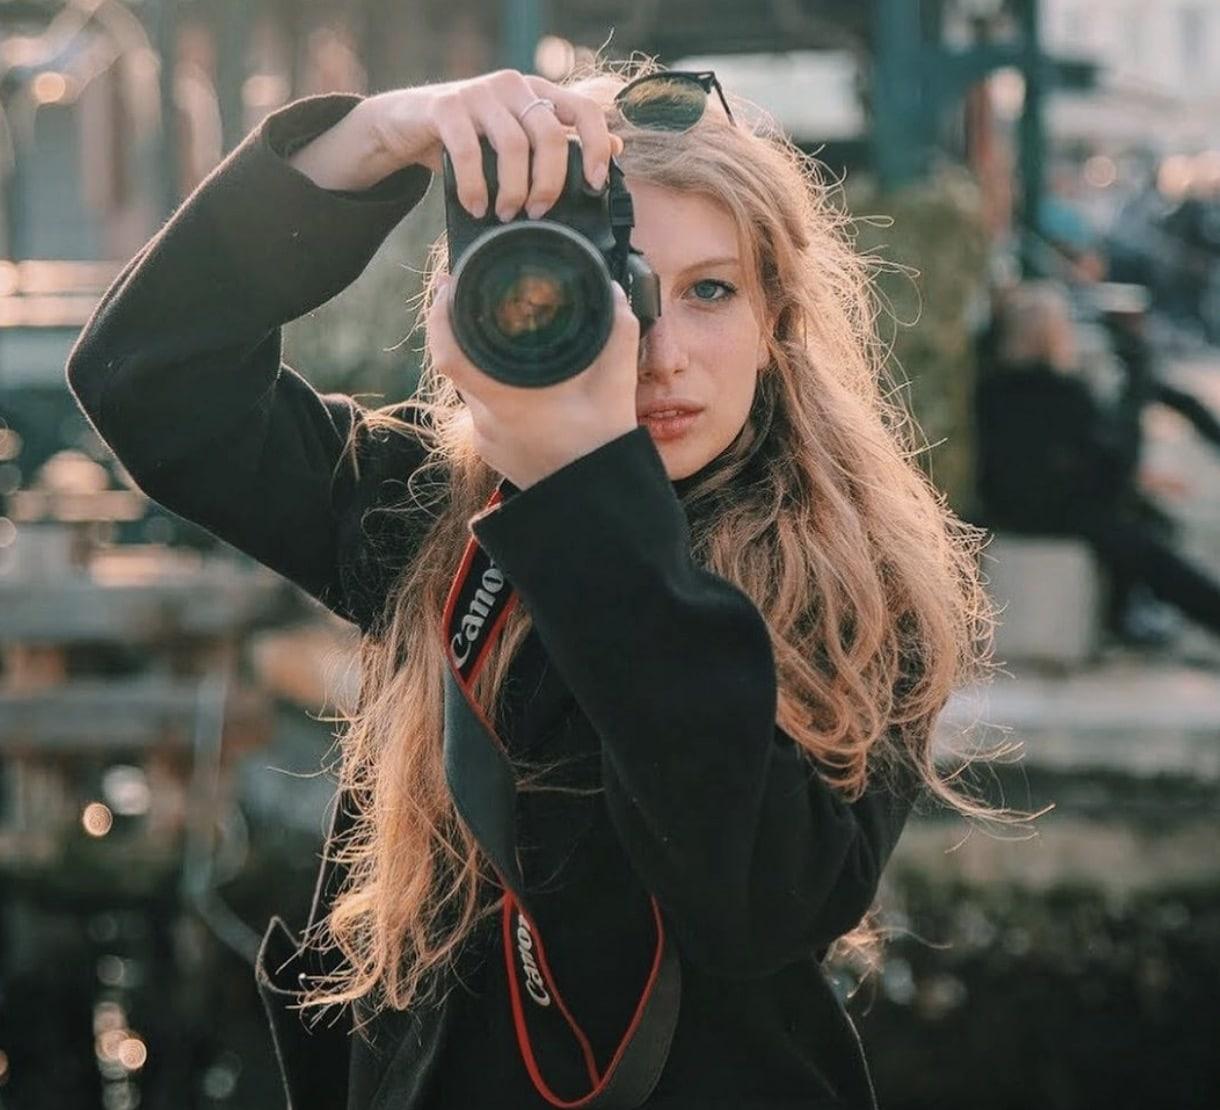 Jessica Zufferli